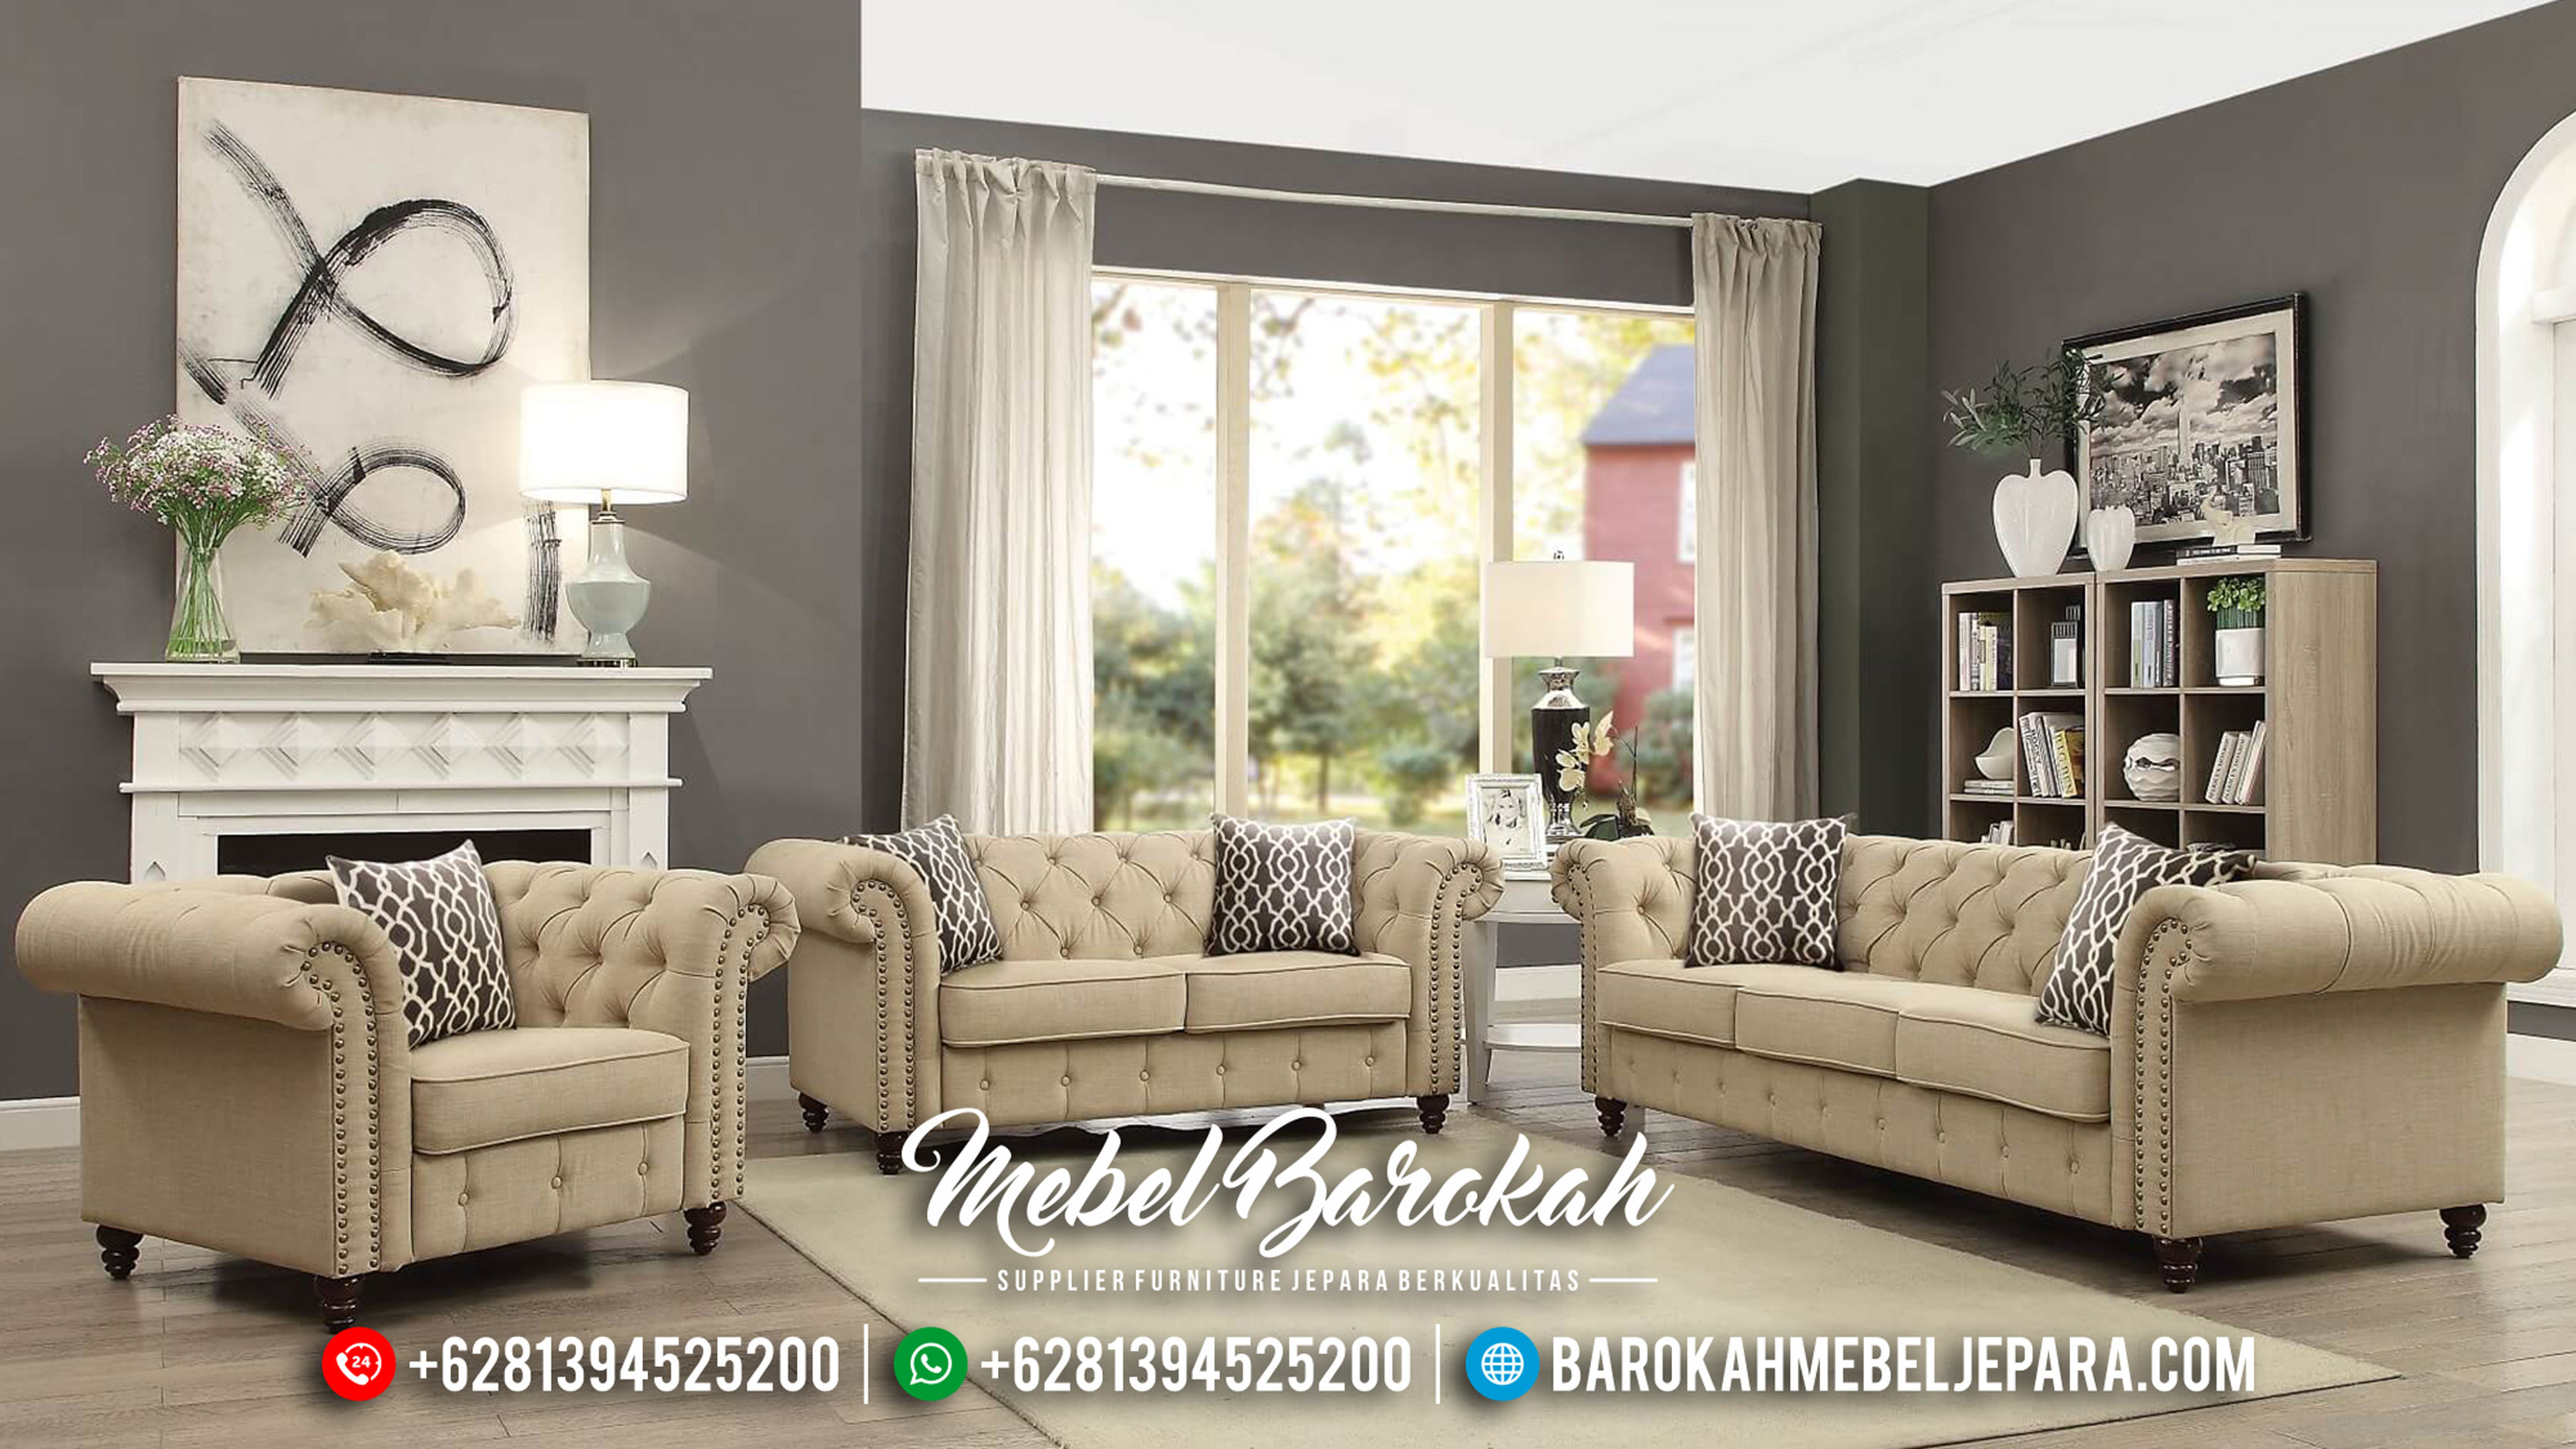 New Design Sofa Tamu Chesterfield Minimalis Modern 2020 MB-0430